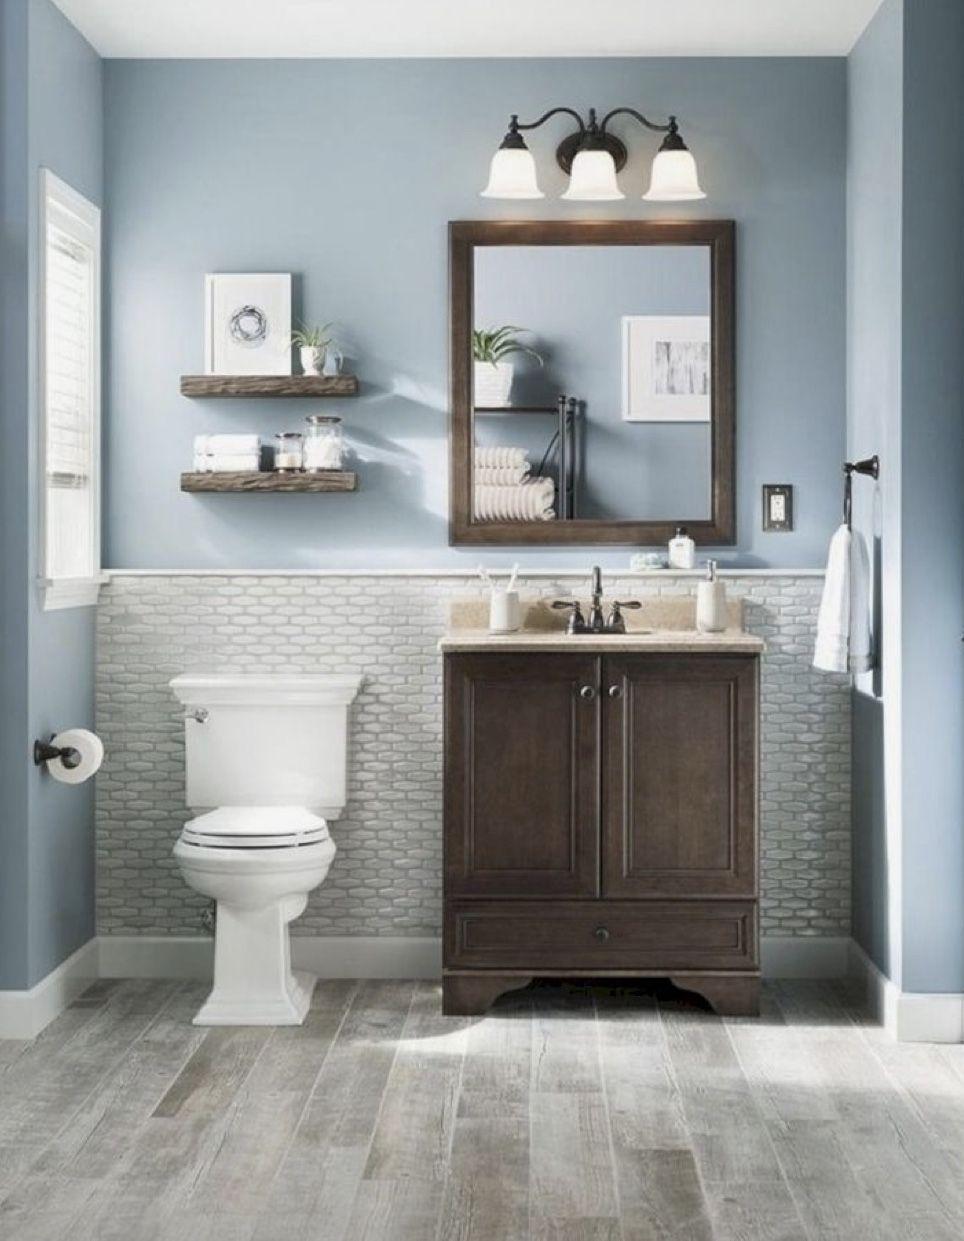 19 Amazing Bathroom Remodeling Tips Ideas Bathrooms Remodel Bathroom Remodel Master Bathroom Design